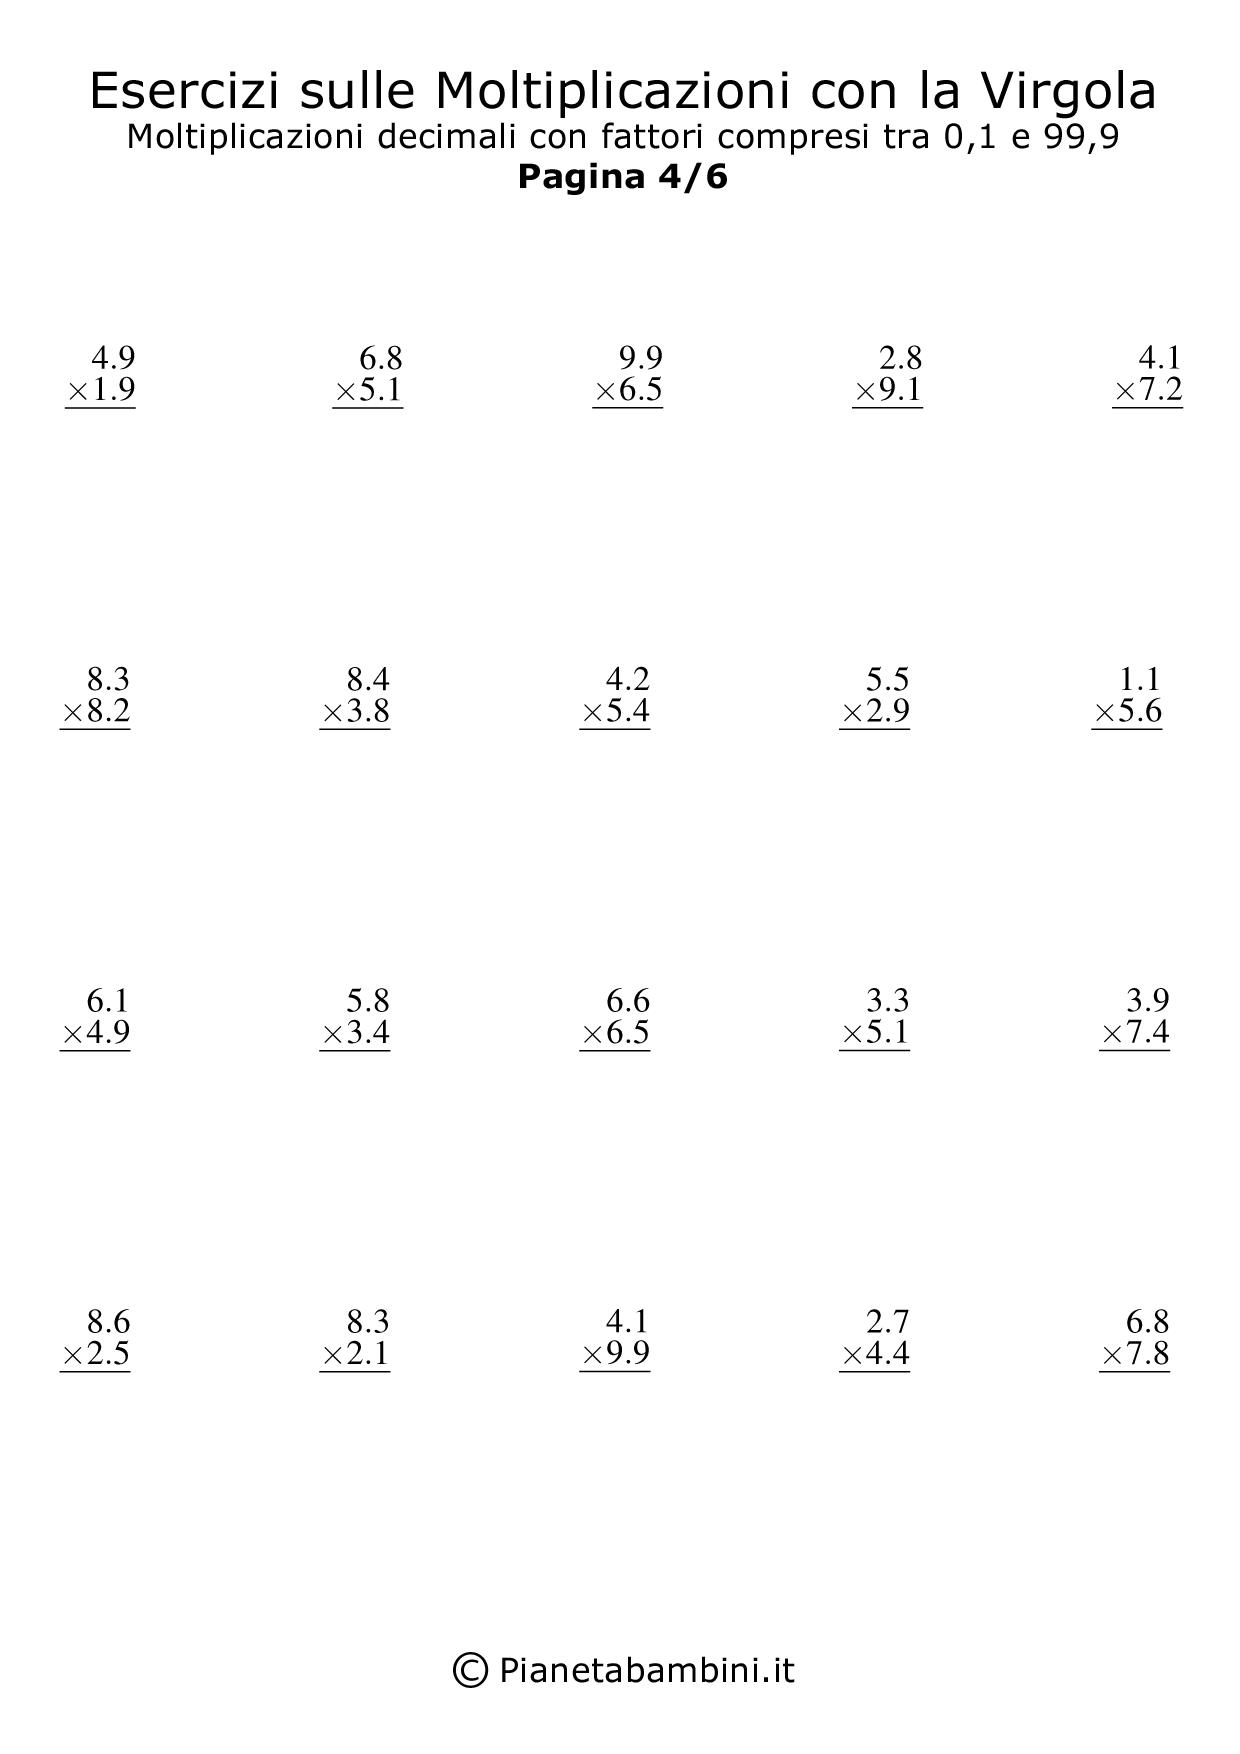 Moltiplicazioni-Virgola-0.1-99.9_4